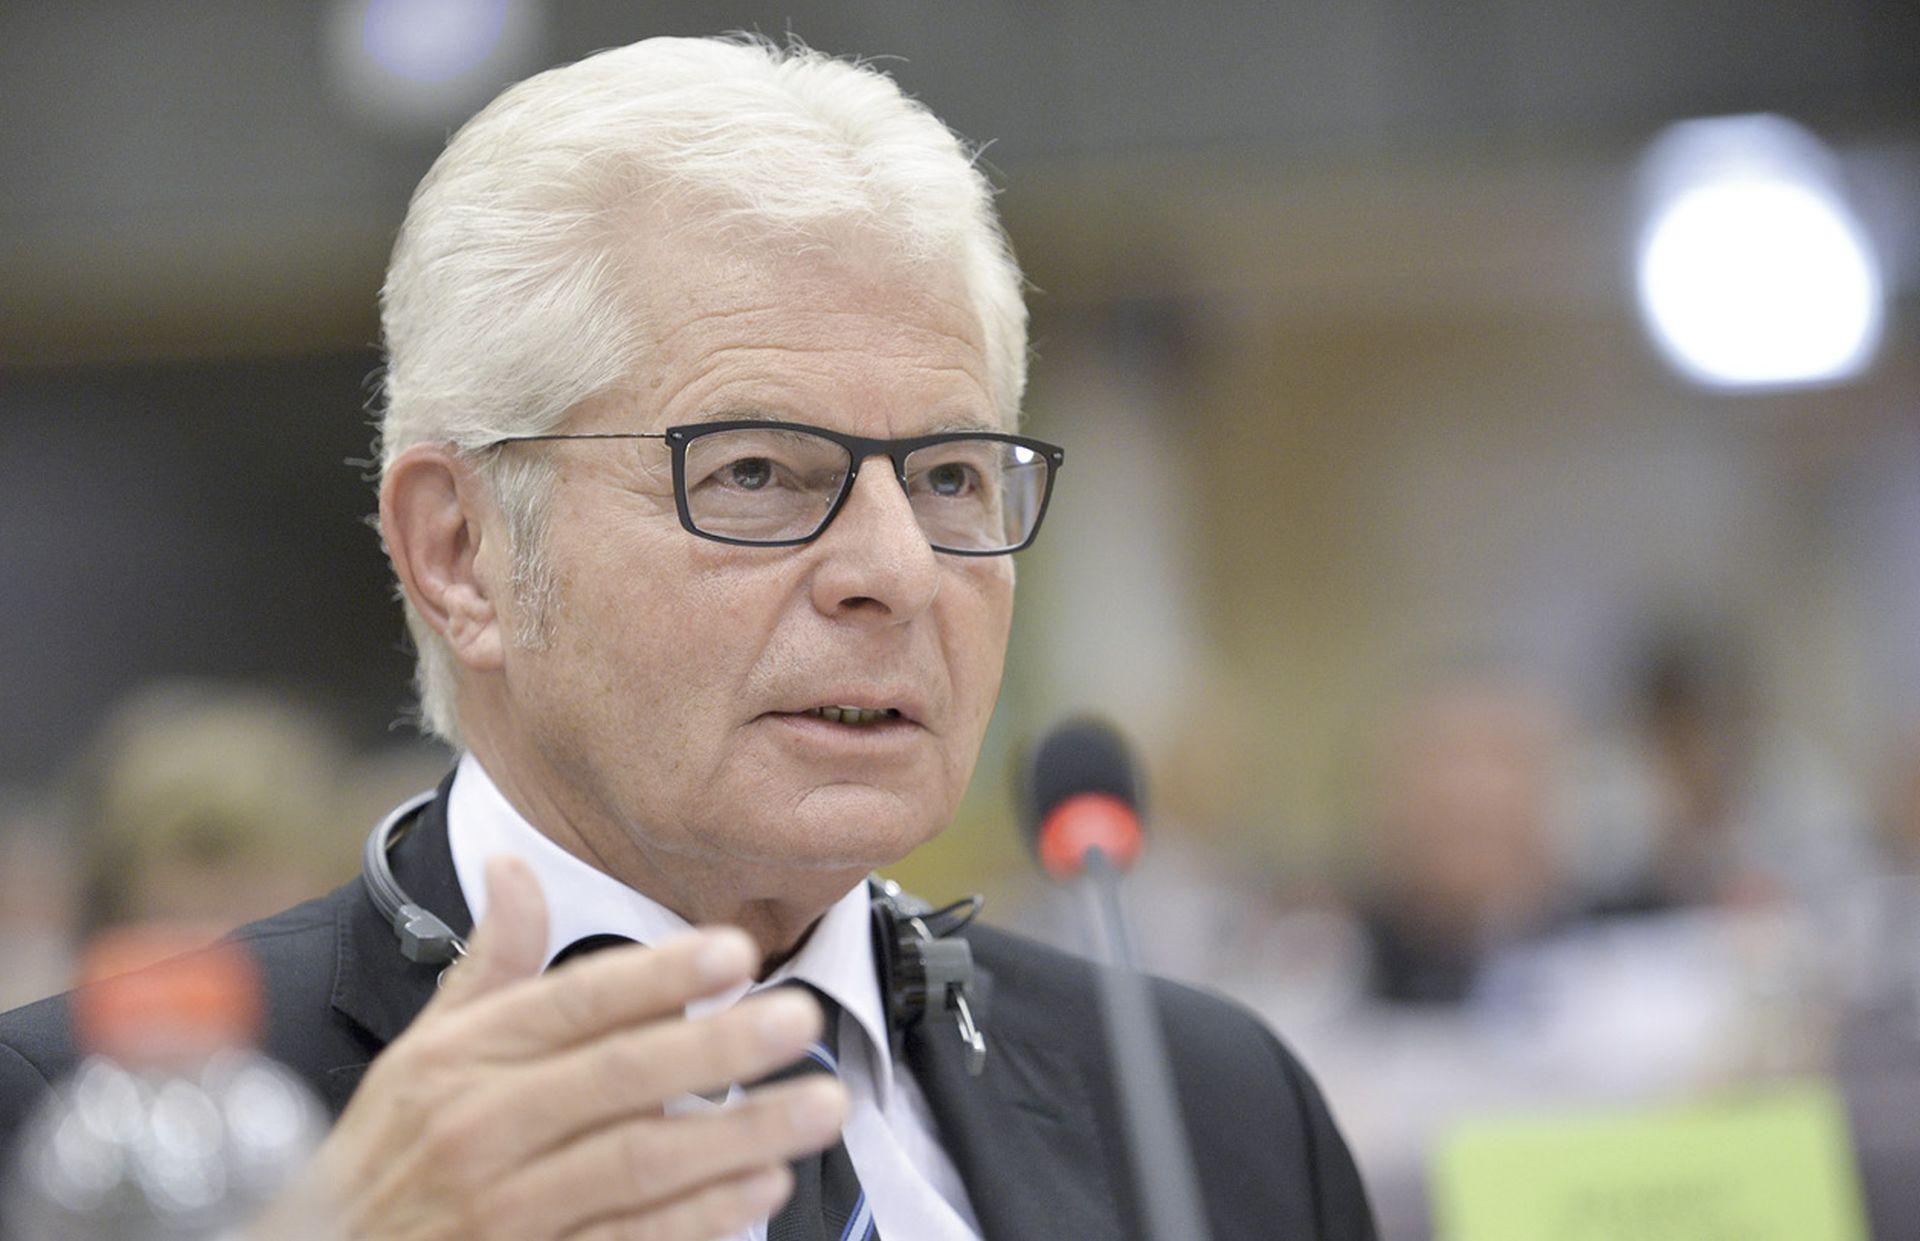 'EU mora pokrenuti novi Marshallov plan za zemlje iz kojih dolaze migranti'